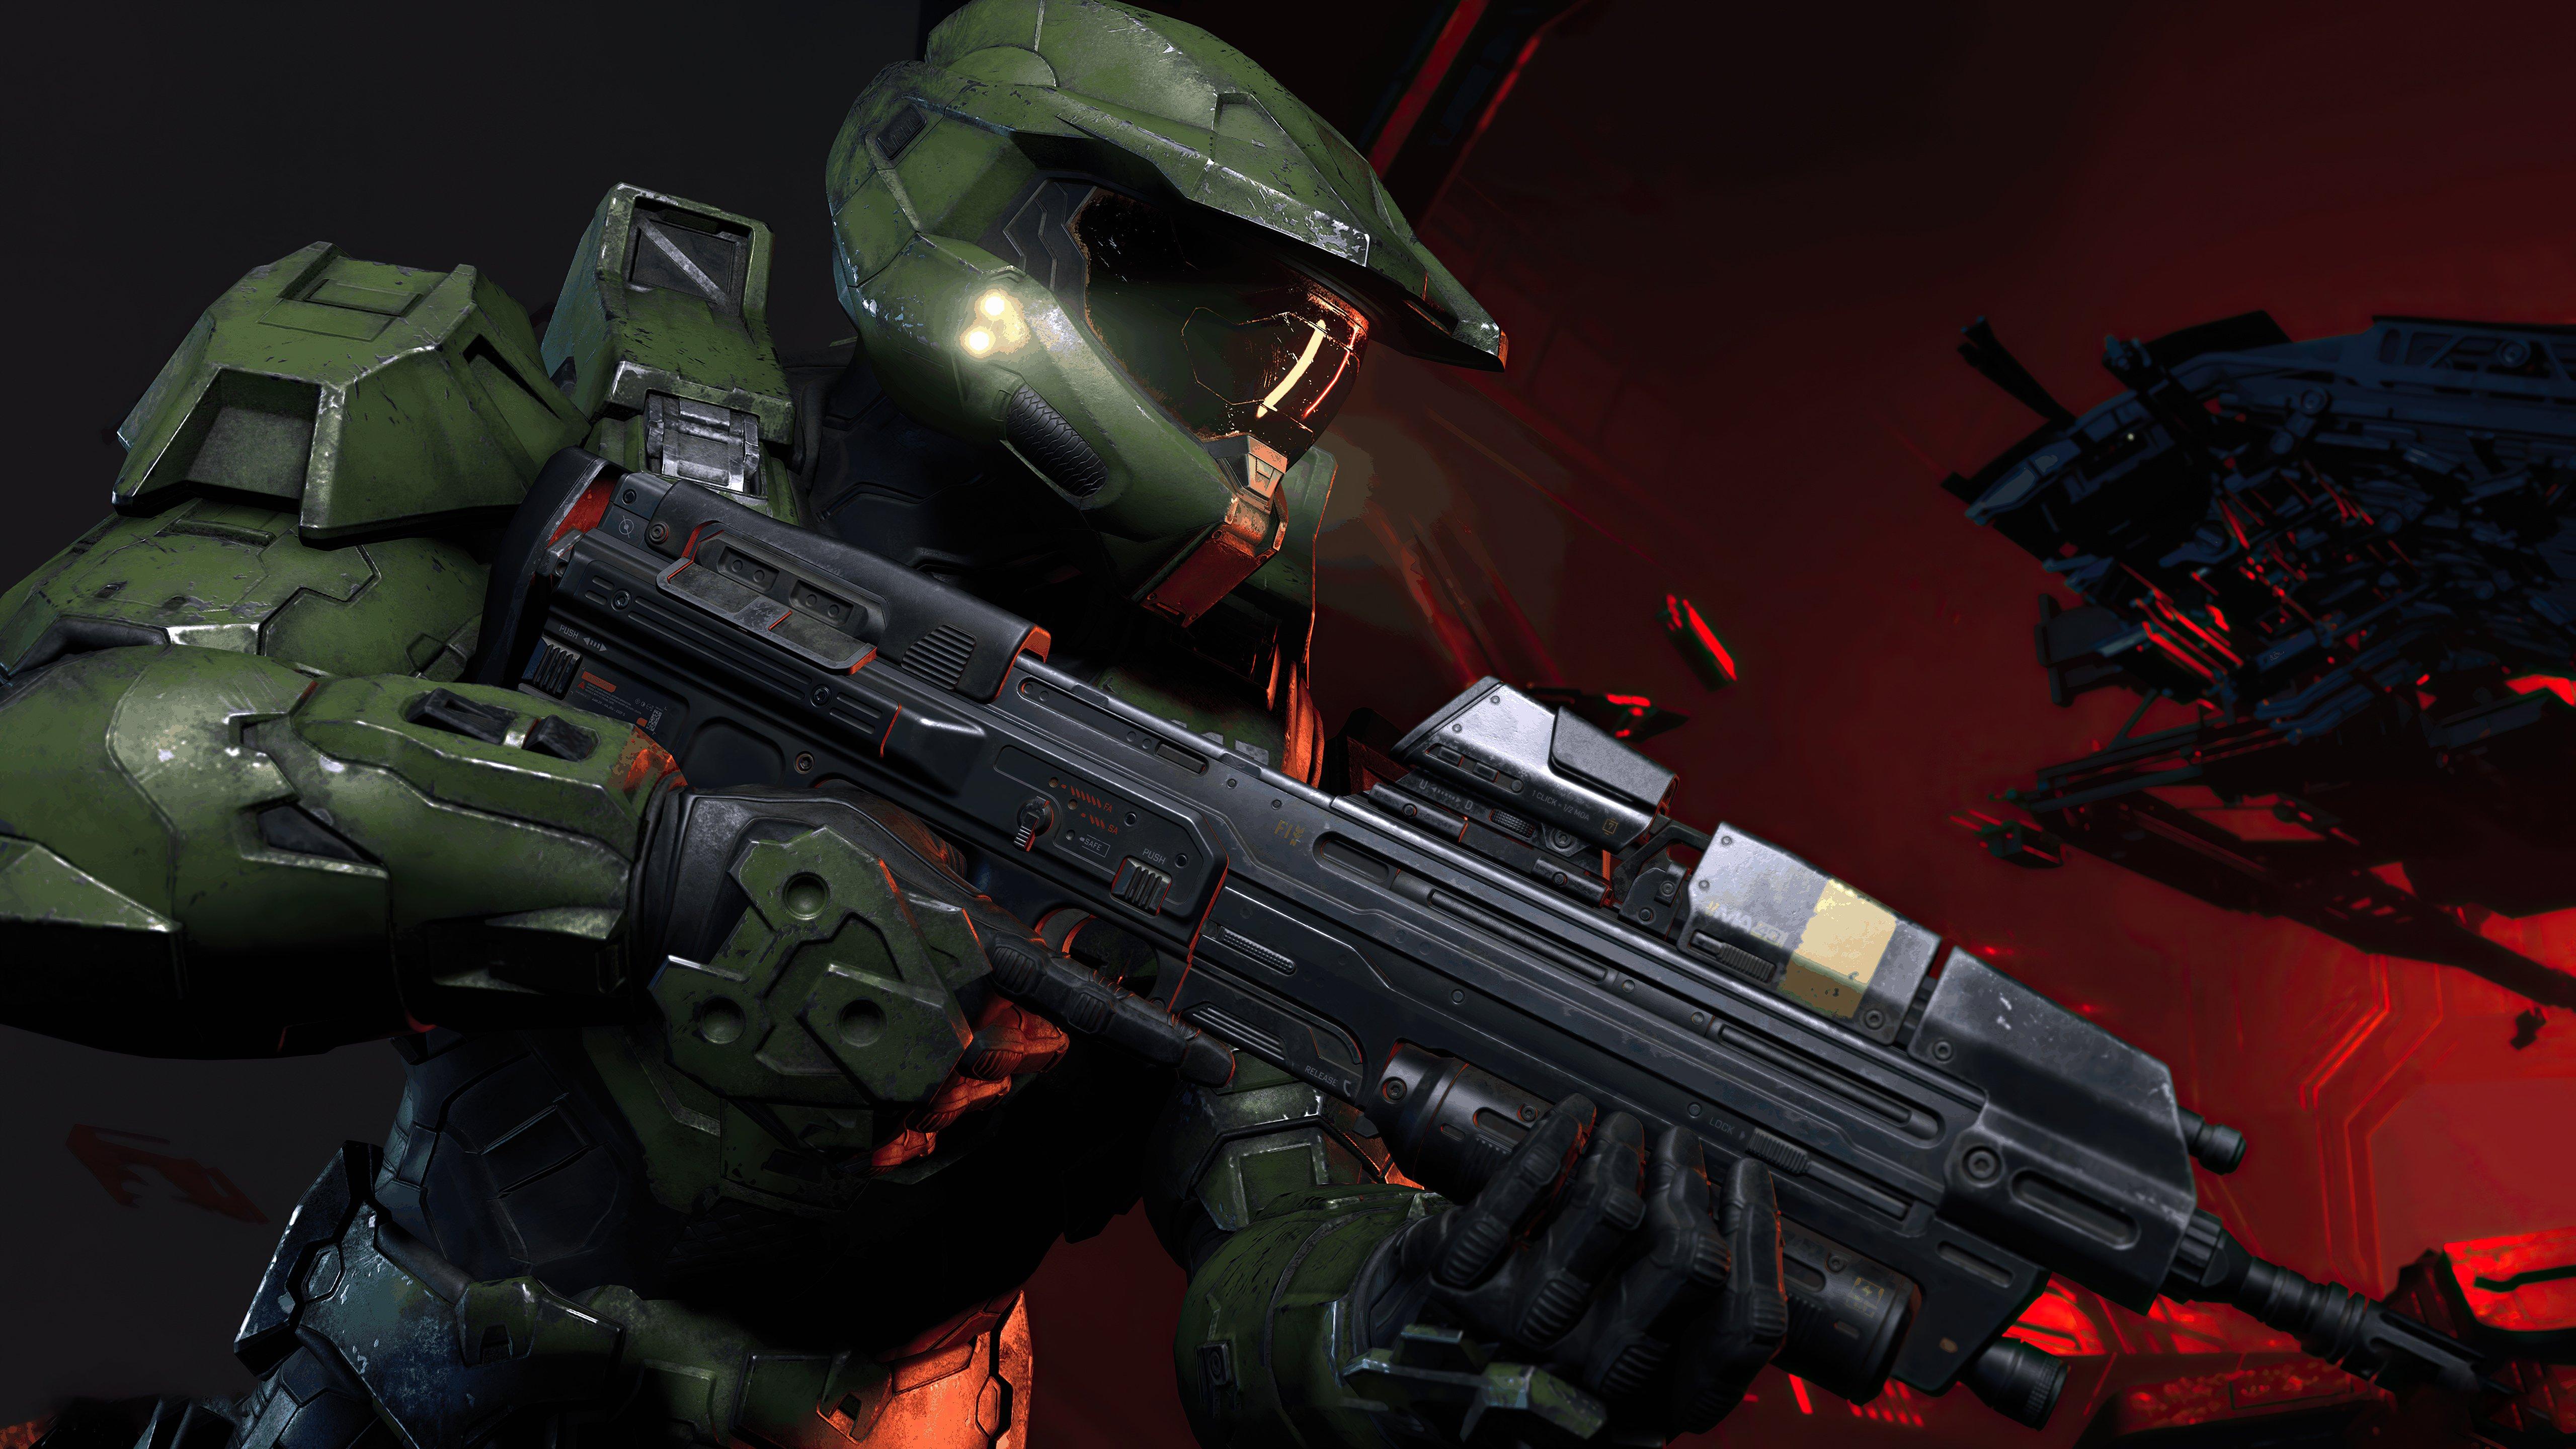 Wallpaper Halo Infinite 343 Industries